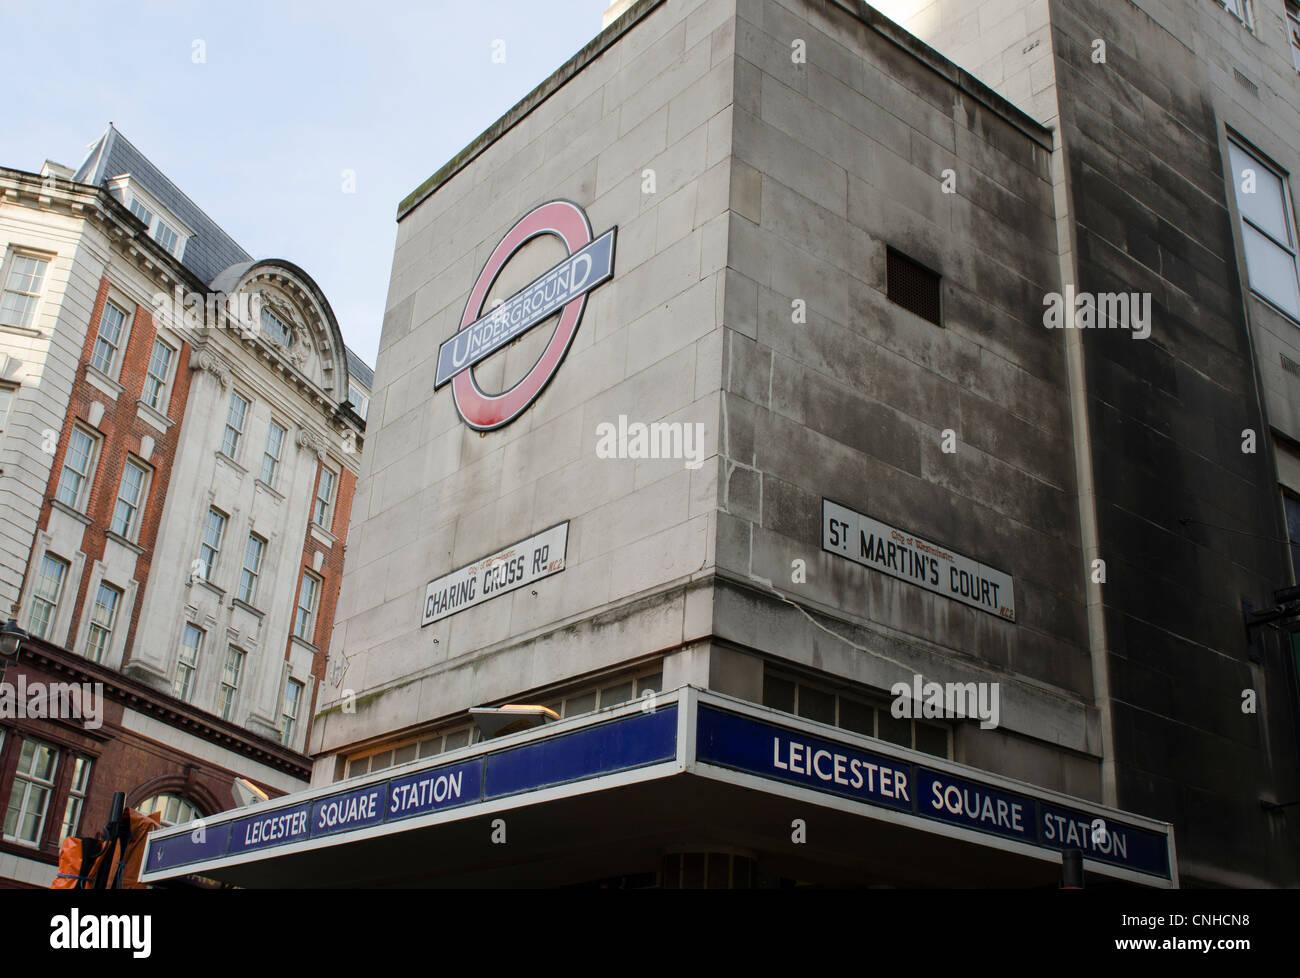 Leicester Square Tube station sign, corner Cranbourne street & Charing Cross Road, London Uk - Stock Image